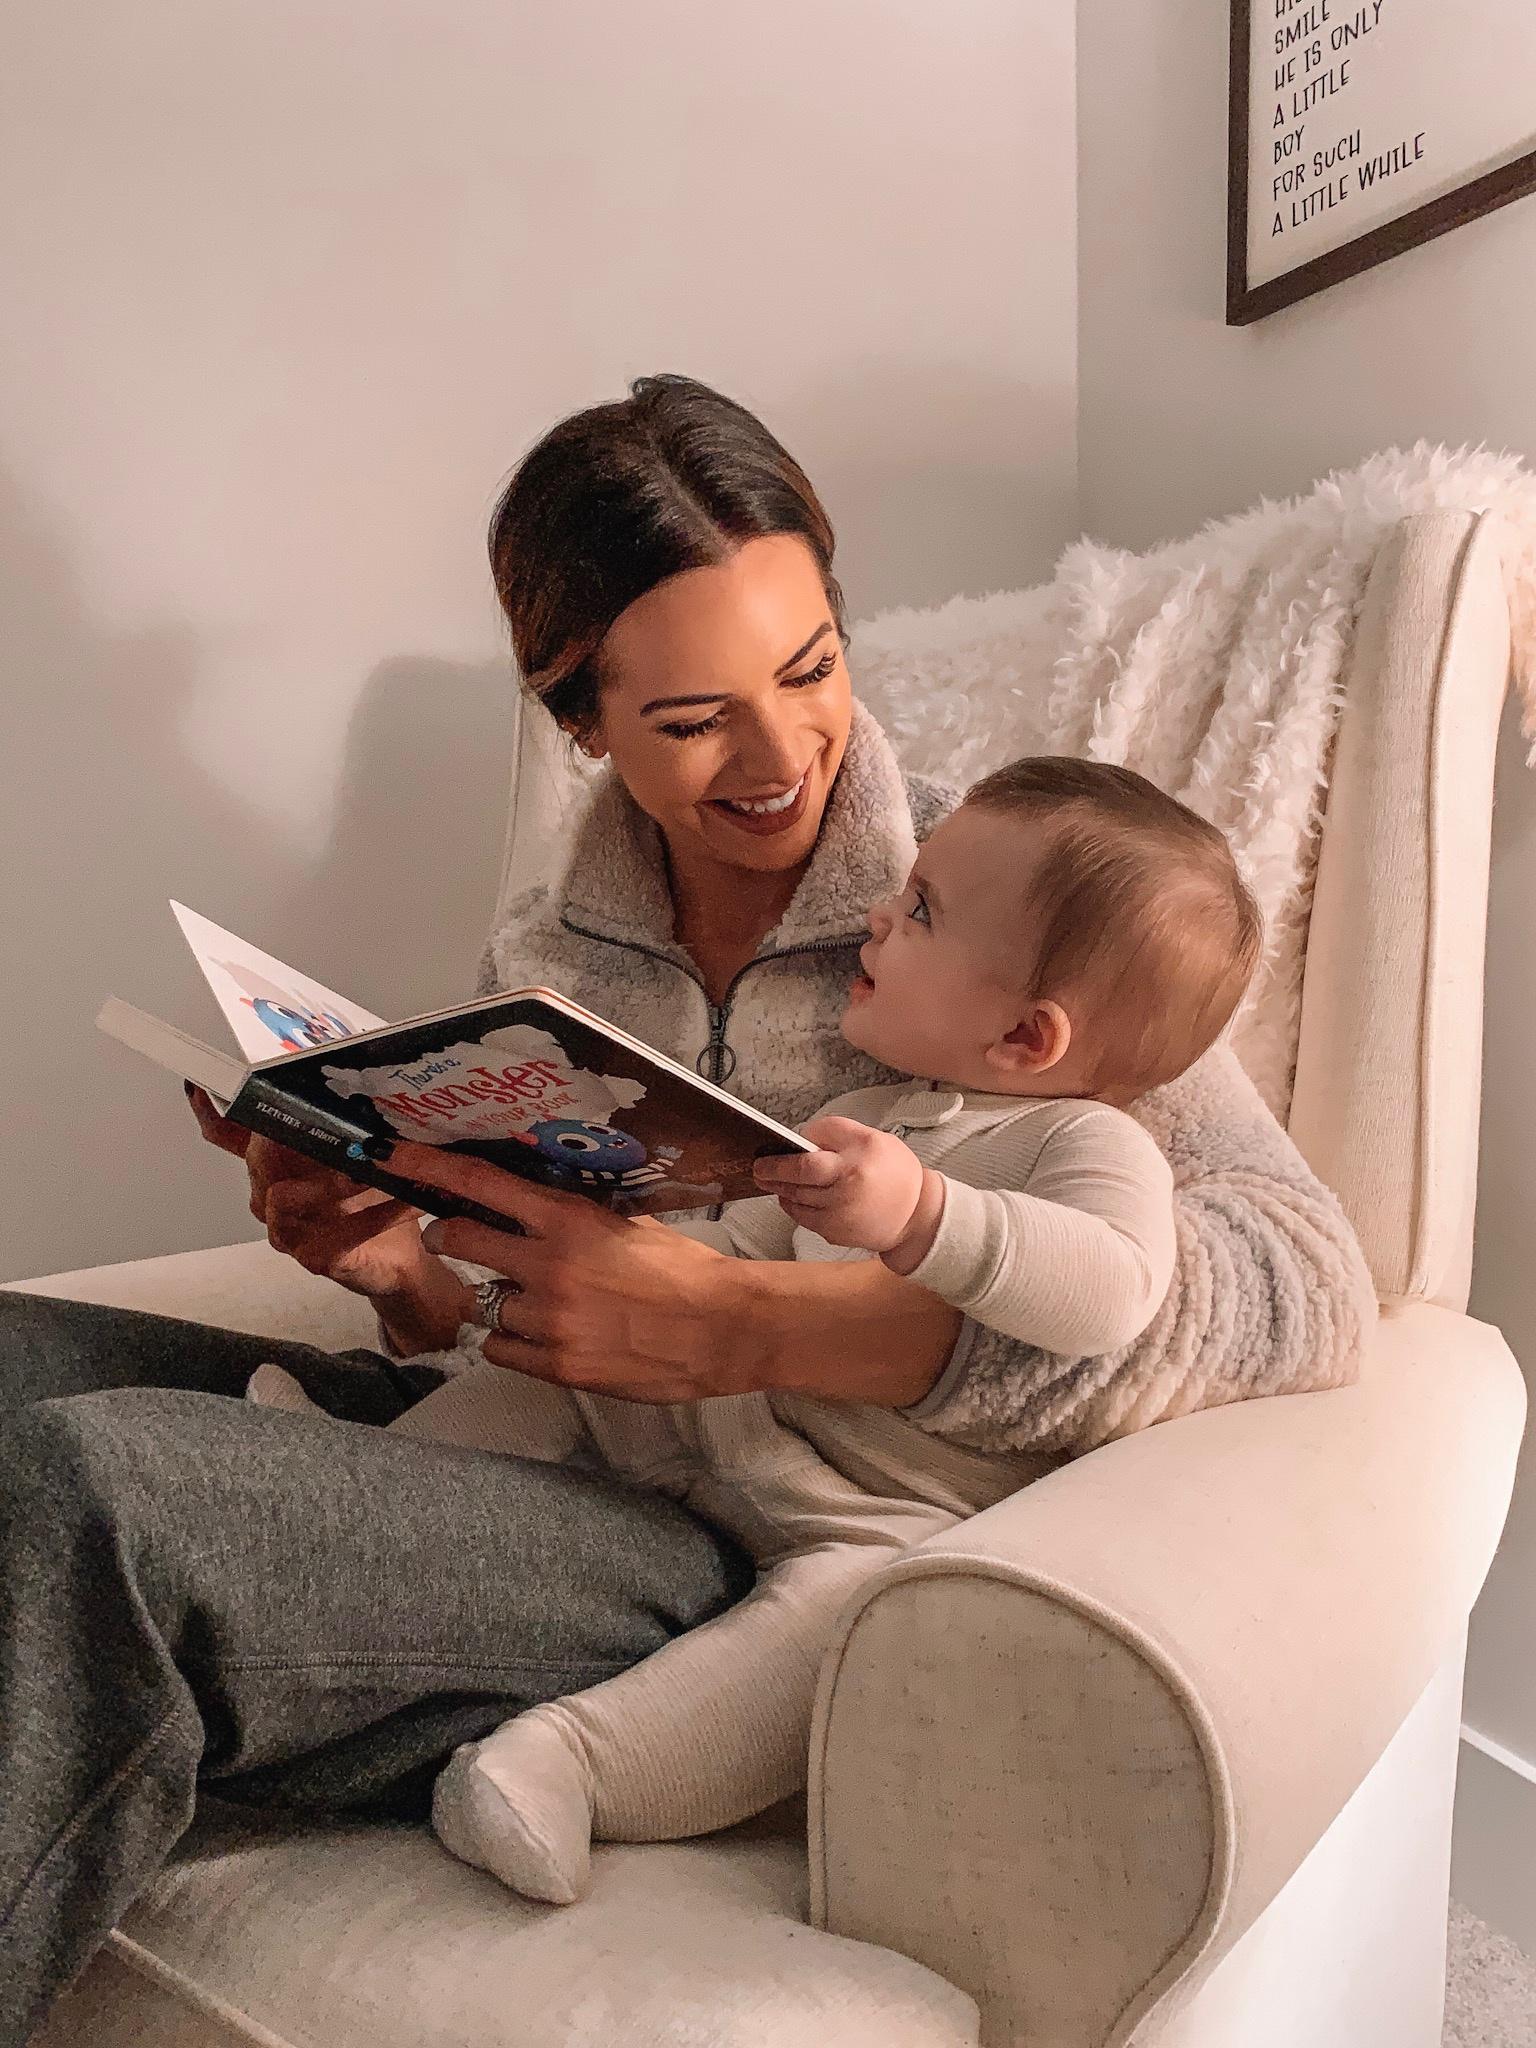 Keldon's favorite storytime books, board books for babies, walmart children's literature